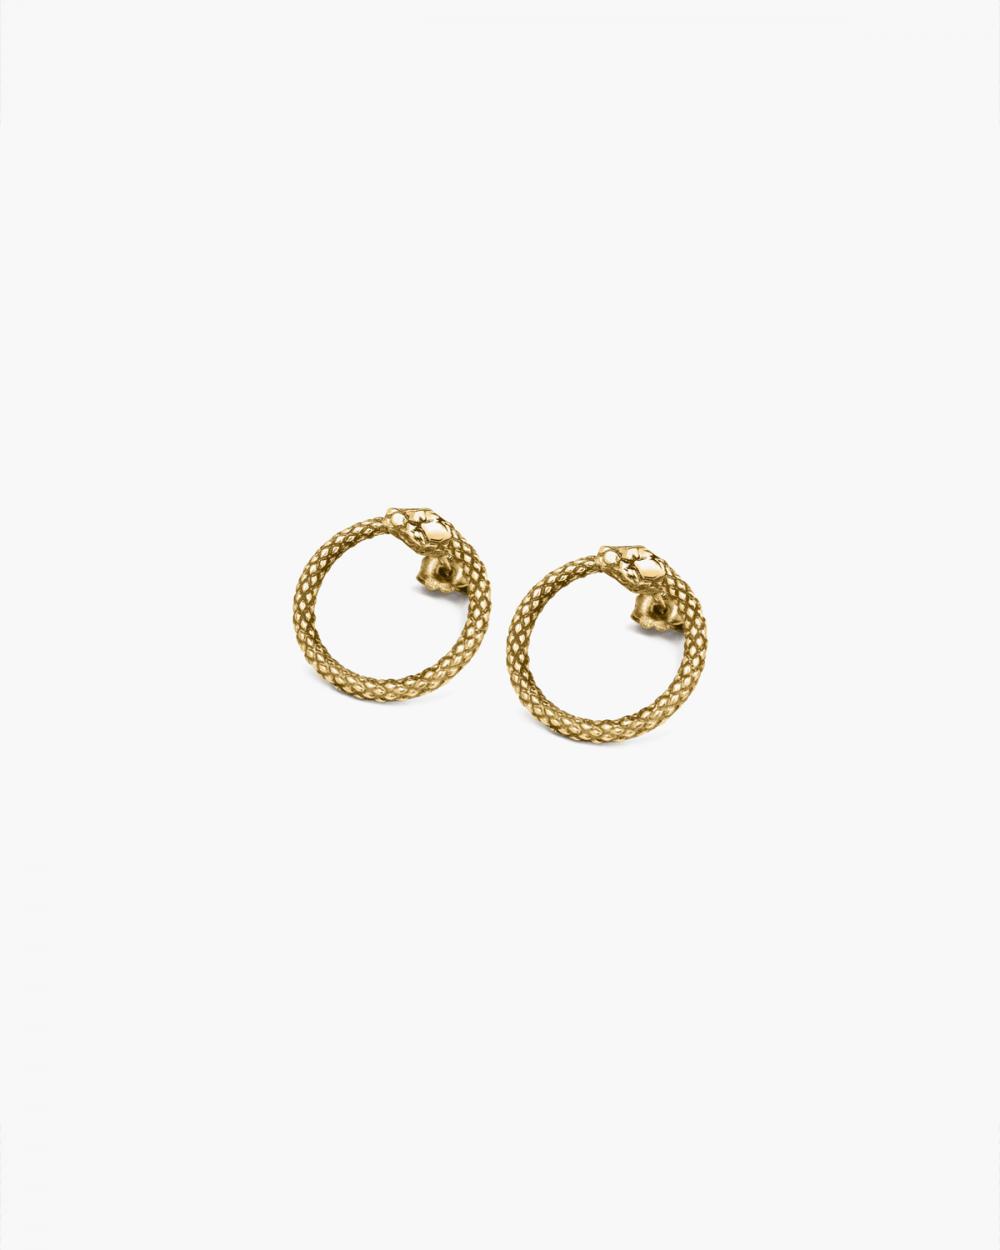 Earrings YELLOW GOLD OUROBOROS EARRINGS NOVE25